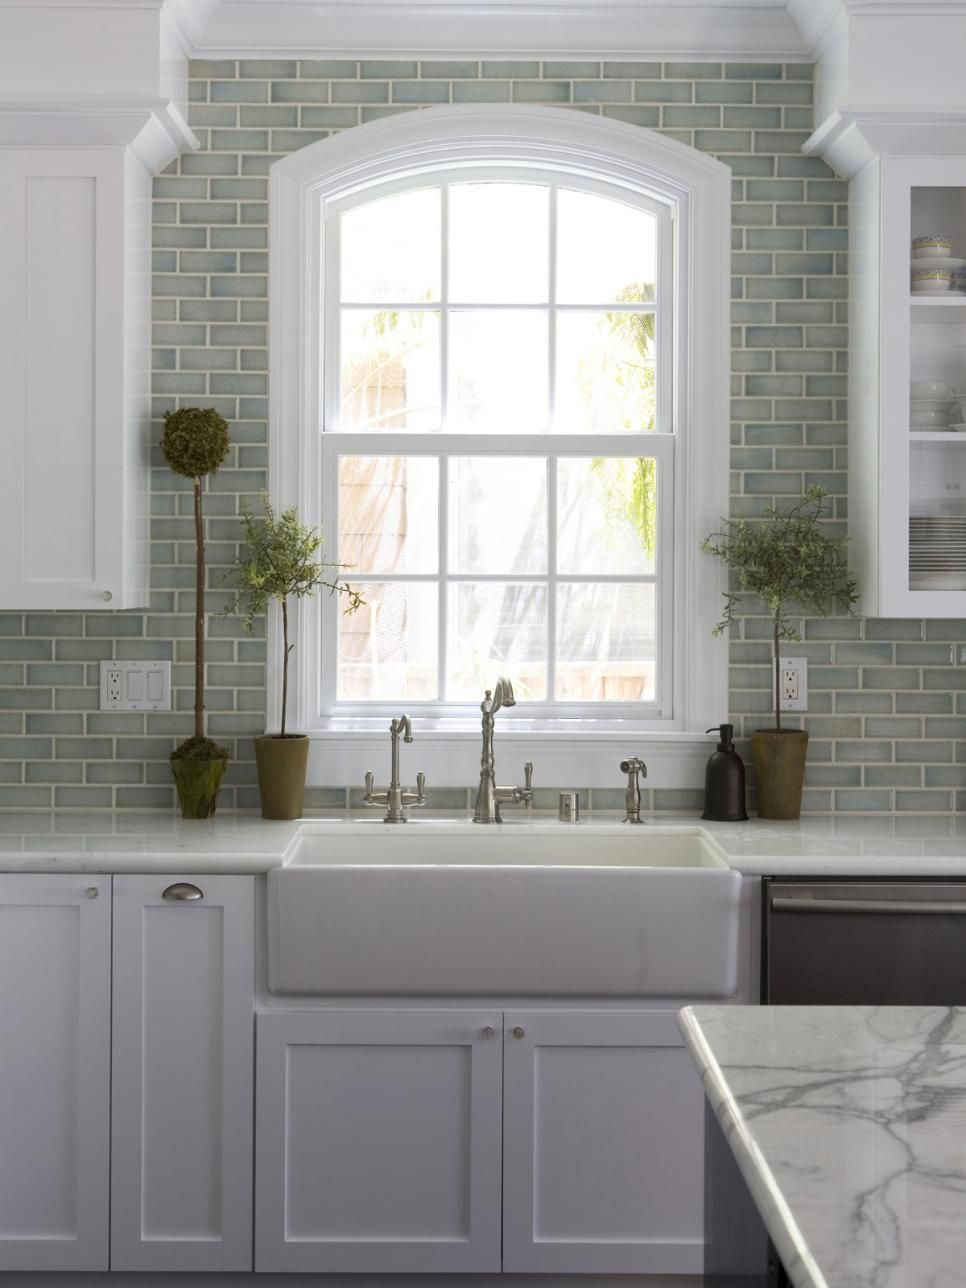 Pictures of Kitchen Backsplash Ideas From | Subway tile backsplash ...